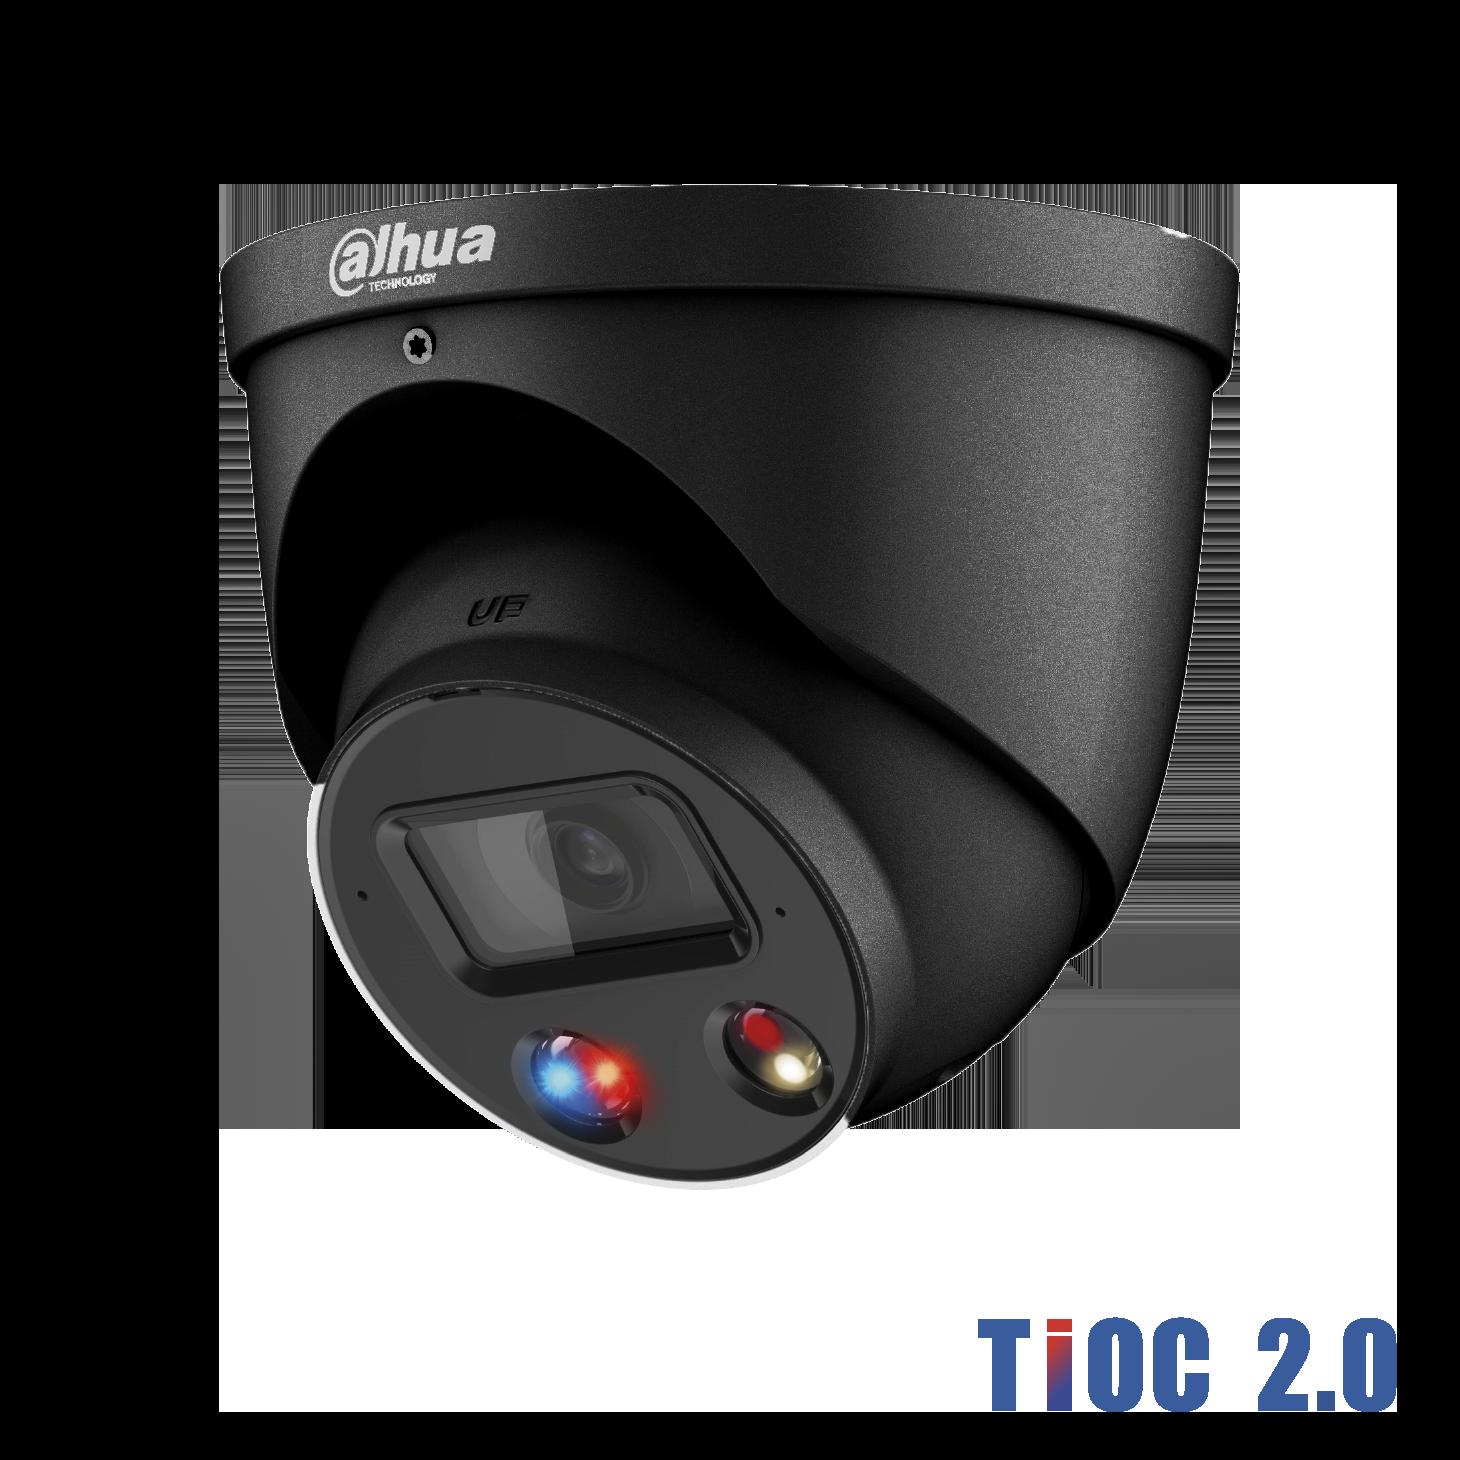 Dahua IP 8MP TiOC 2.0 Dome 2.8mm Black Dual Illumination 30mtr